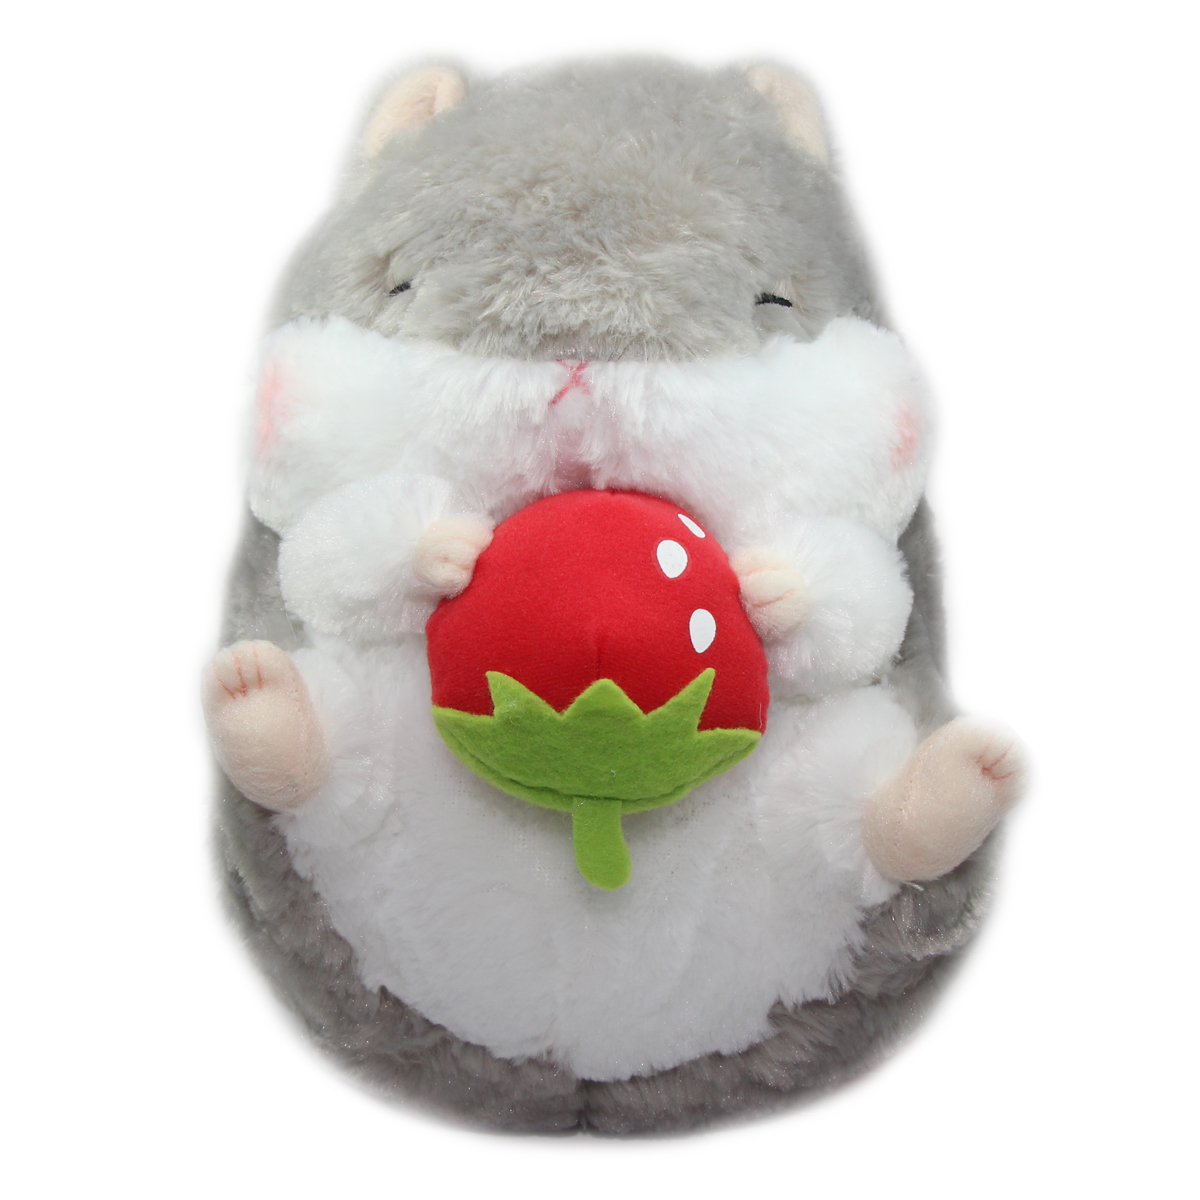 Hamster Plush Doll Amuse Coroham Coron Ichigo Collection Grey Jumbo 10 Inches